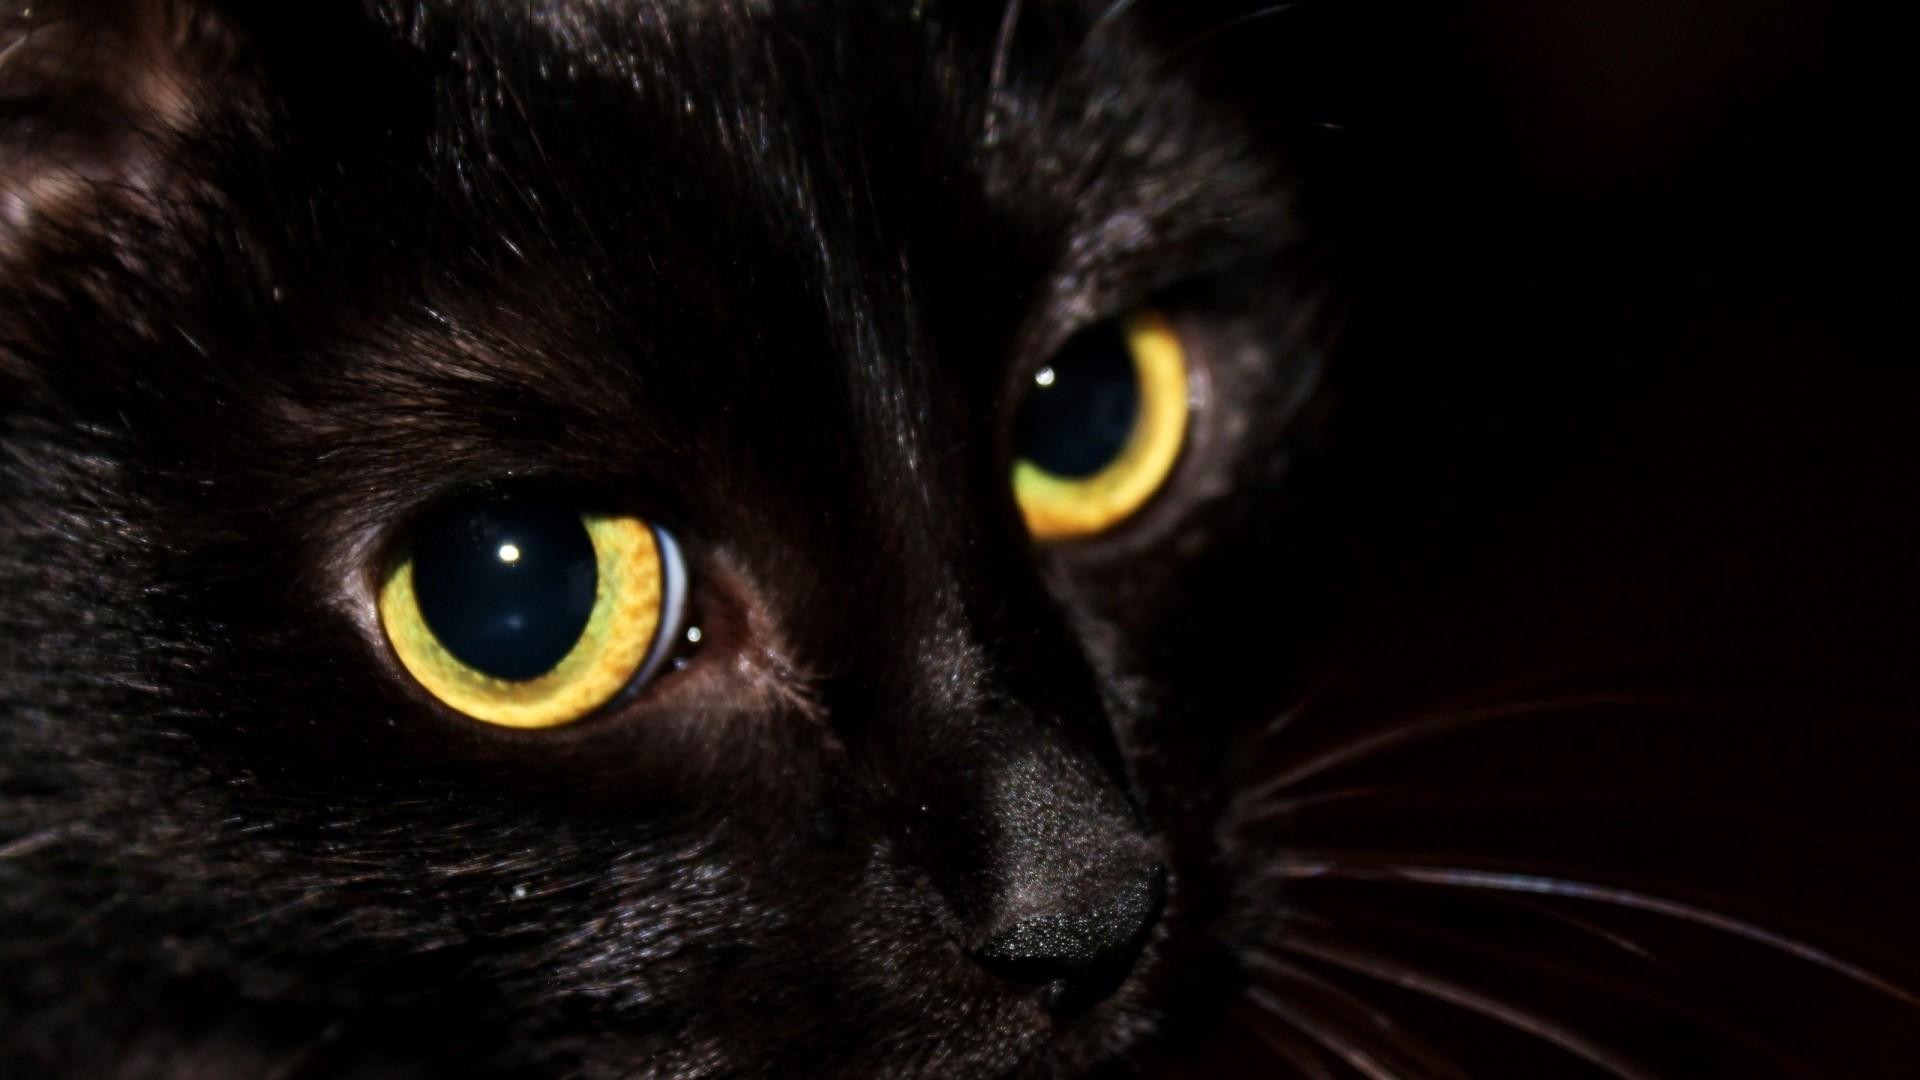 Black Cat Wallpaper Picture hd